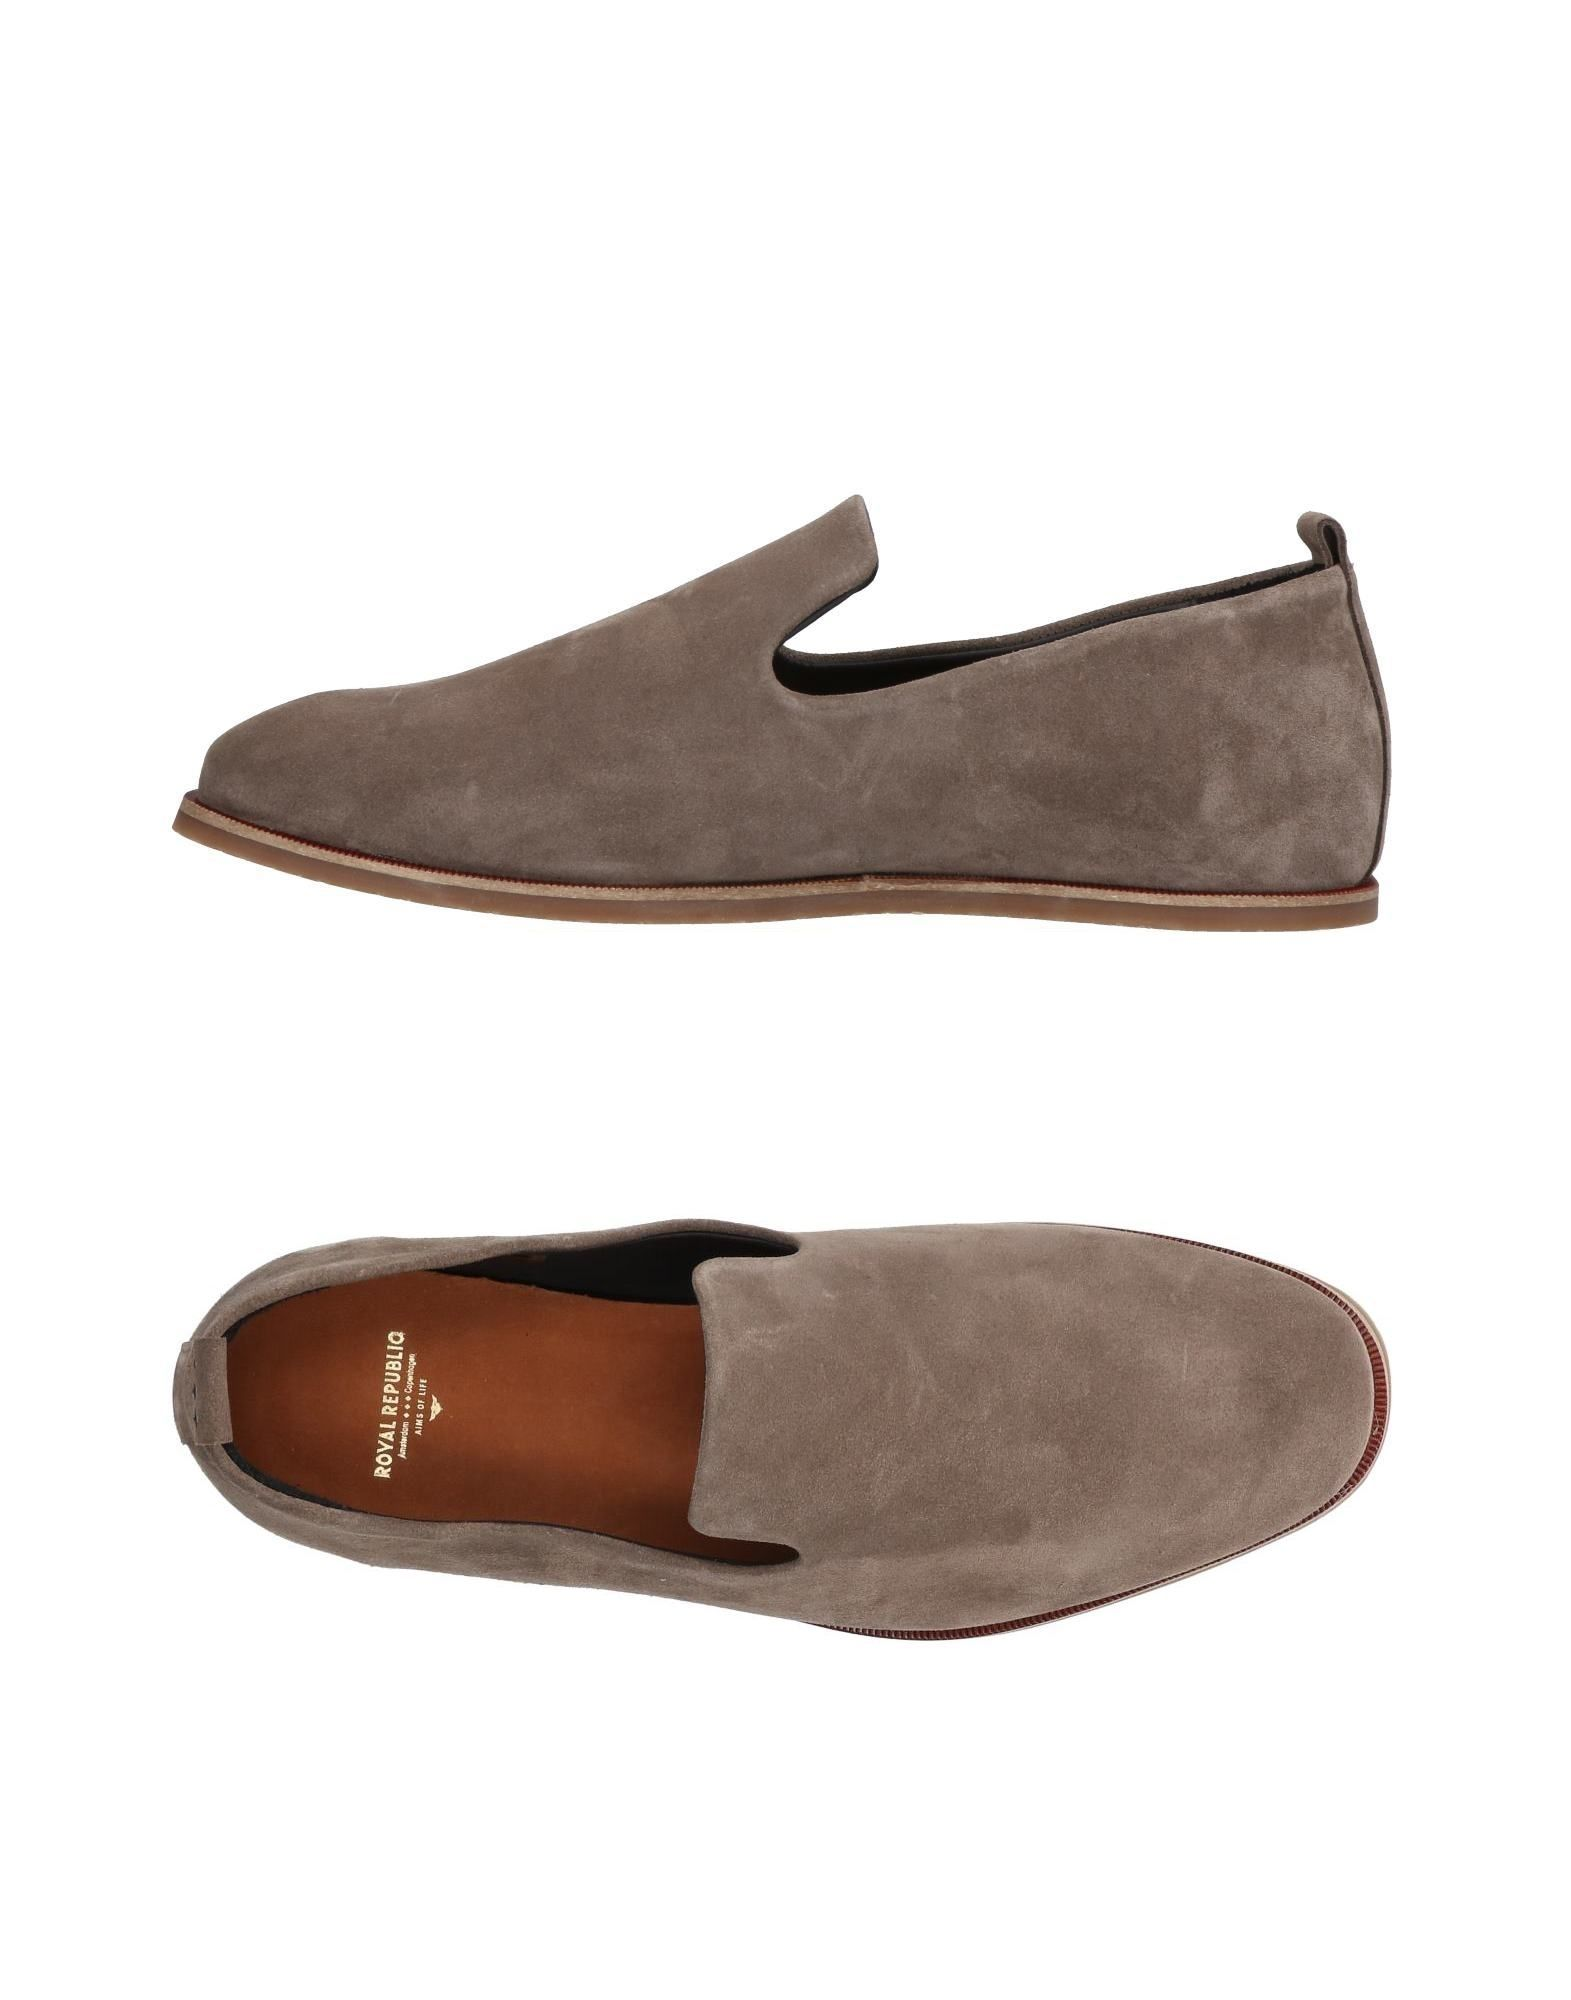 Royal Republiq Mokassins Herren  11417126IS Gute Qualität beliebte Schuhe